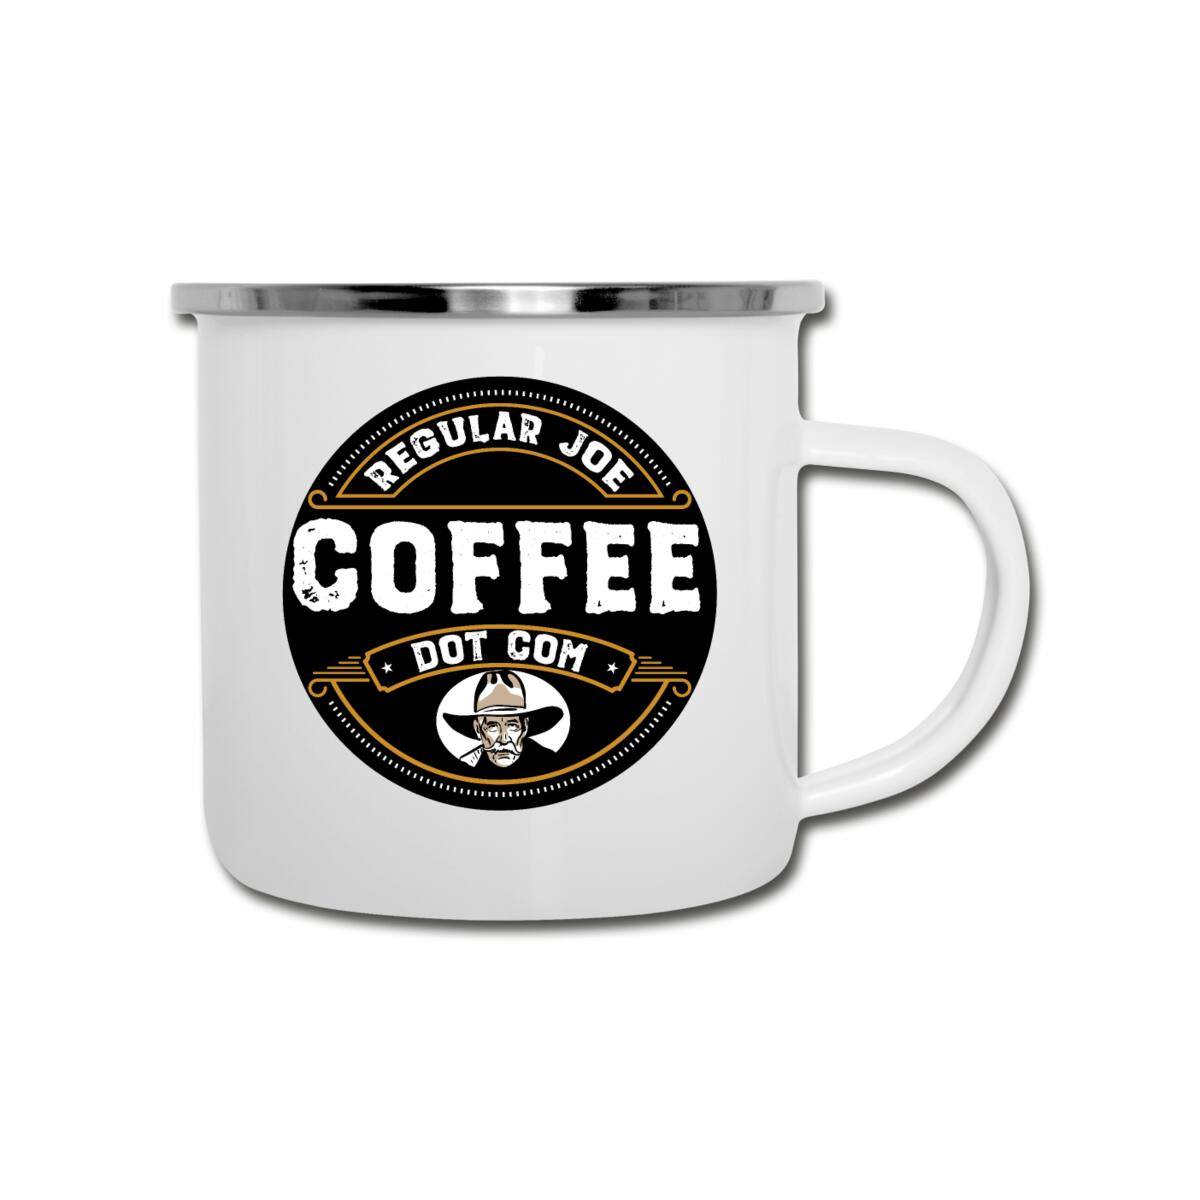 Regular Joe Logo Mug